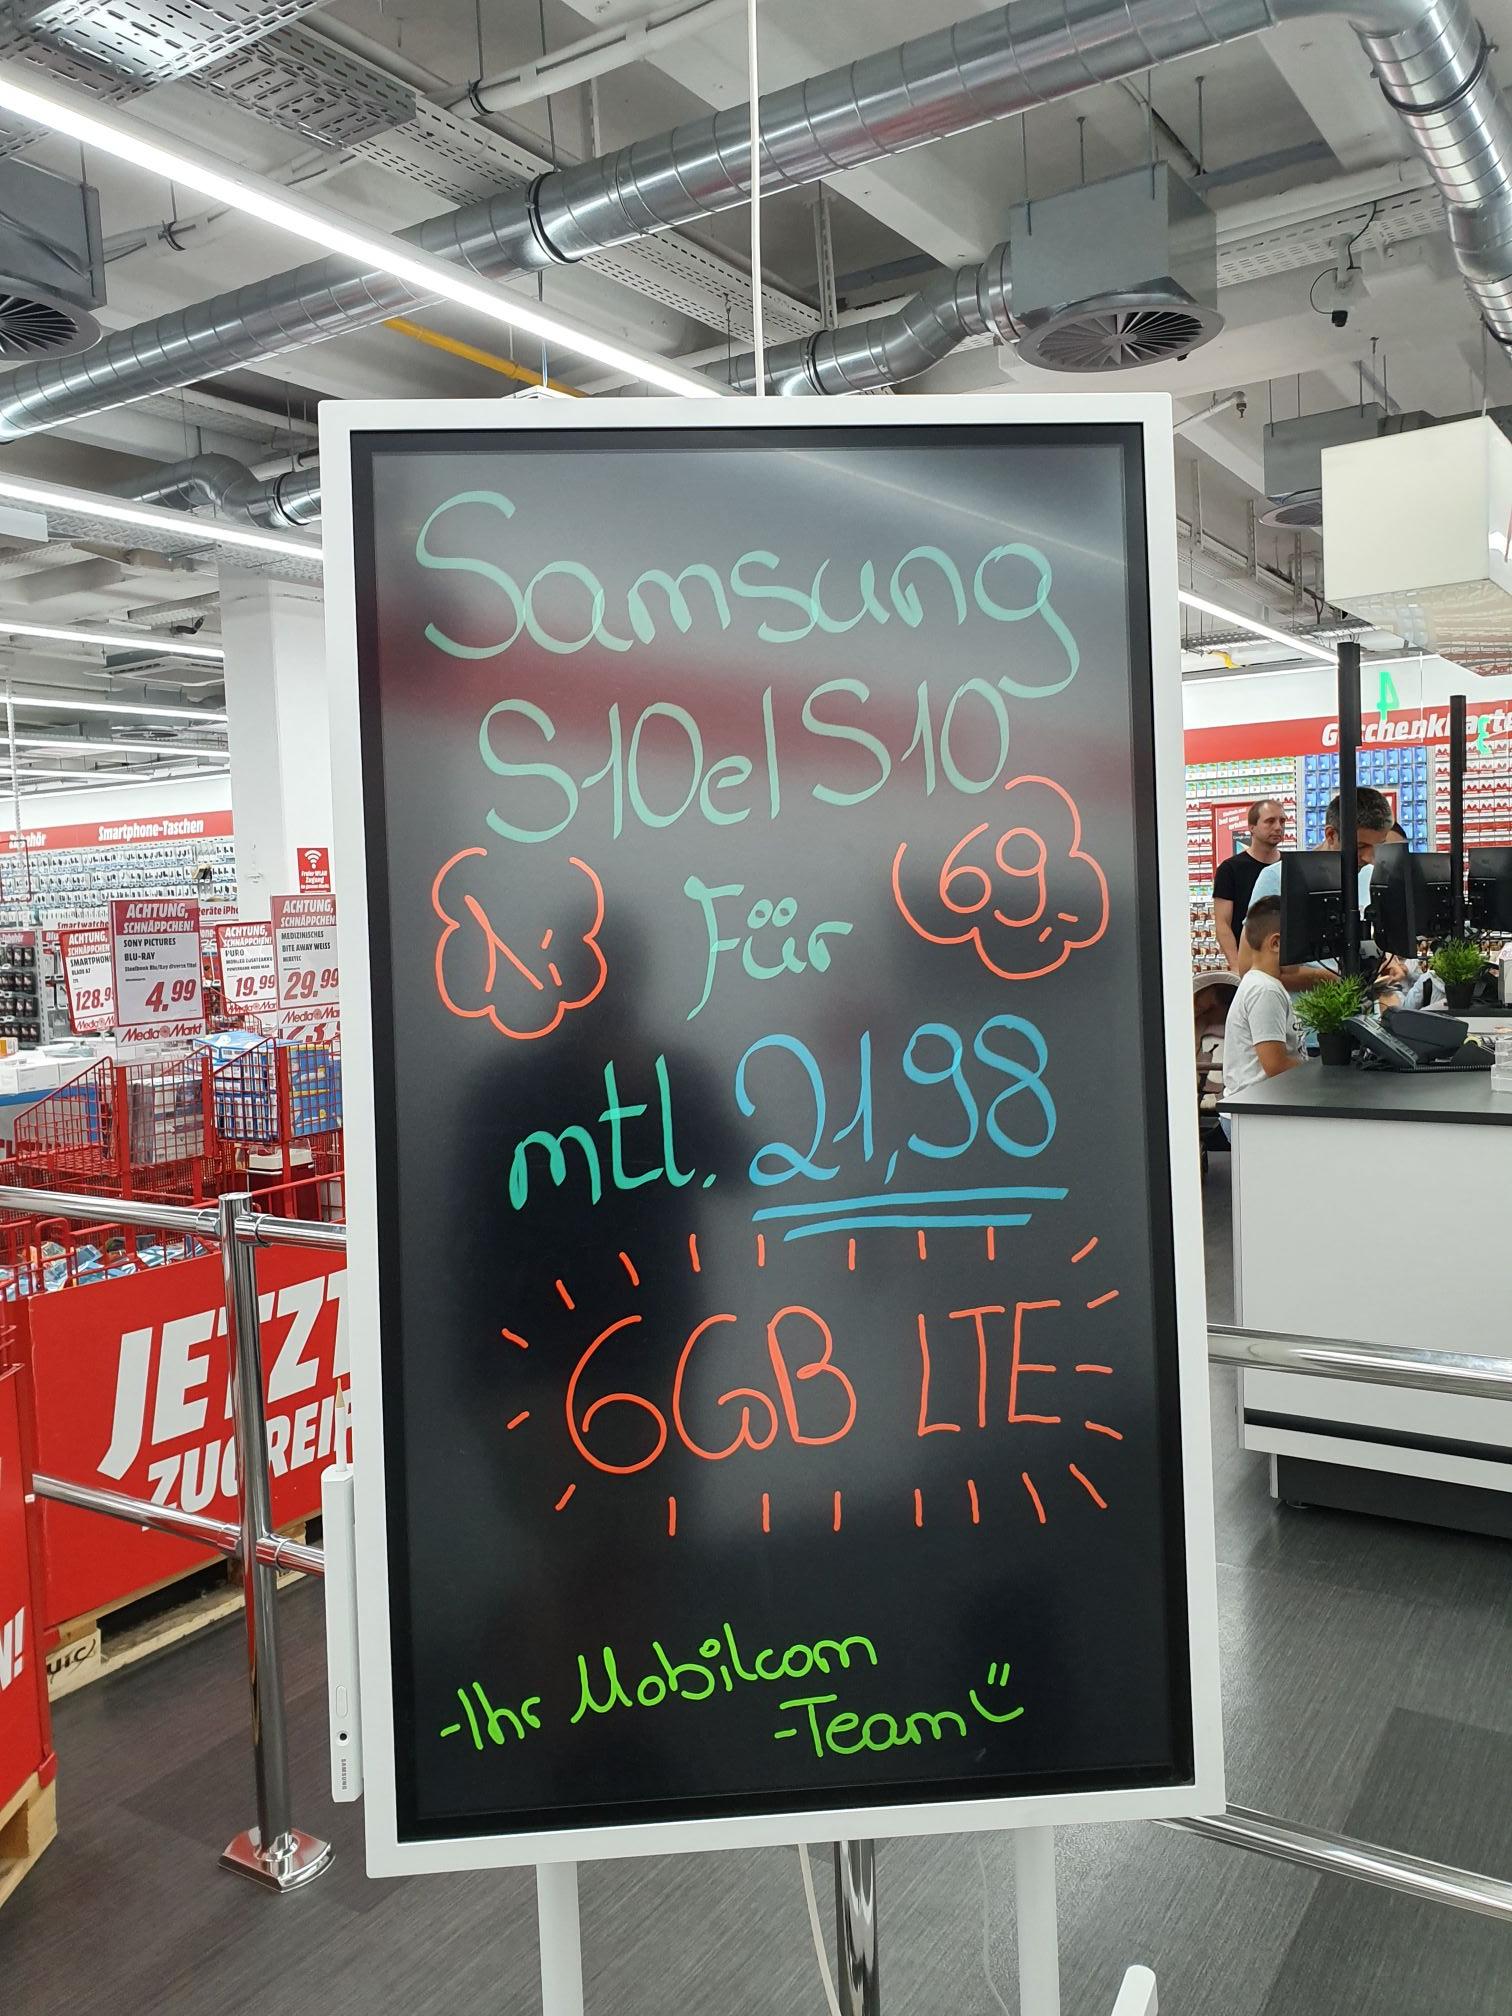 [Lokal MM Reutlingen] Samsung Galaxy S10/S10e inkl. 6 GB-Flat für 594,36